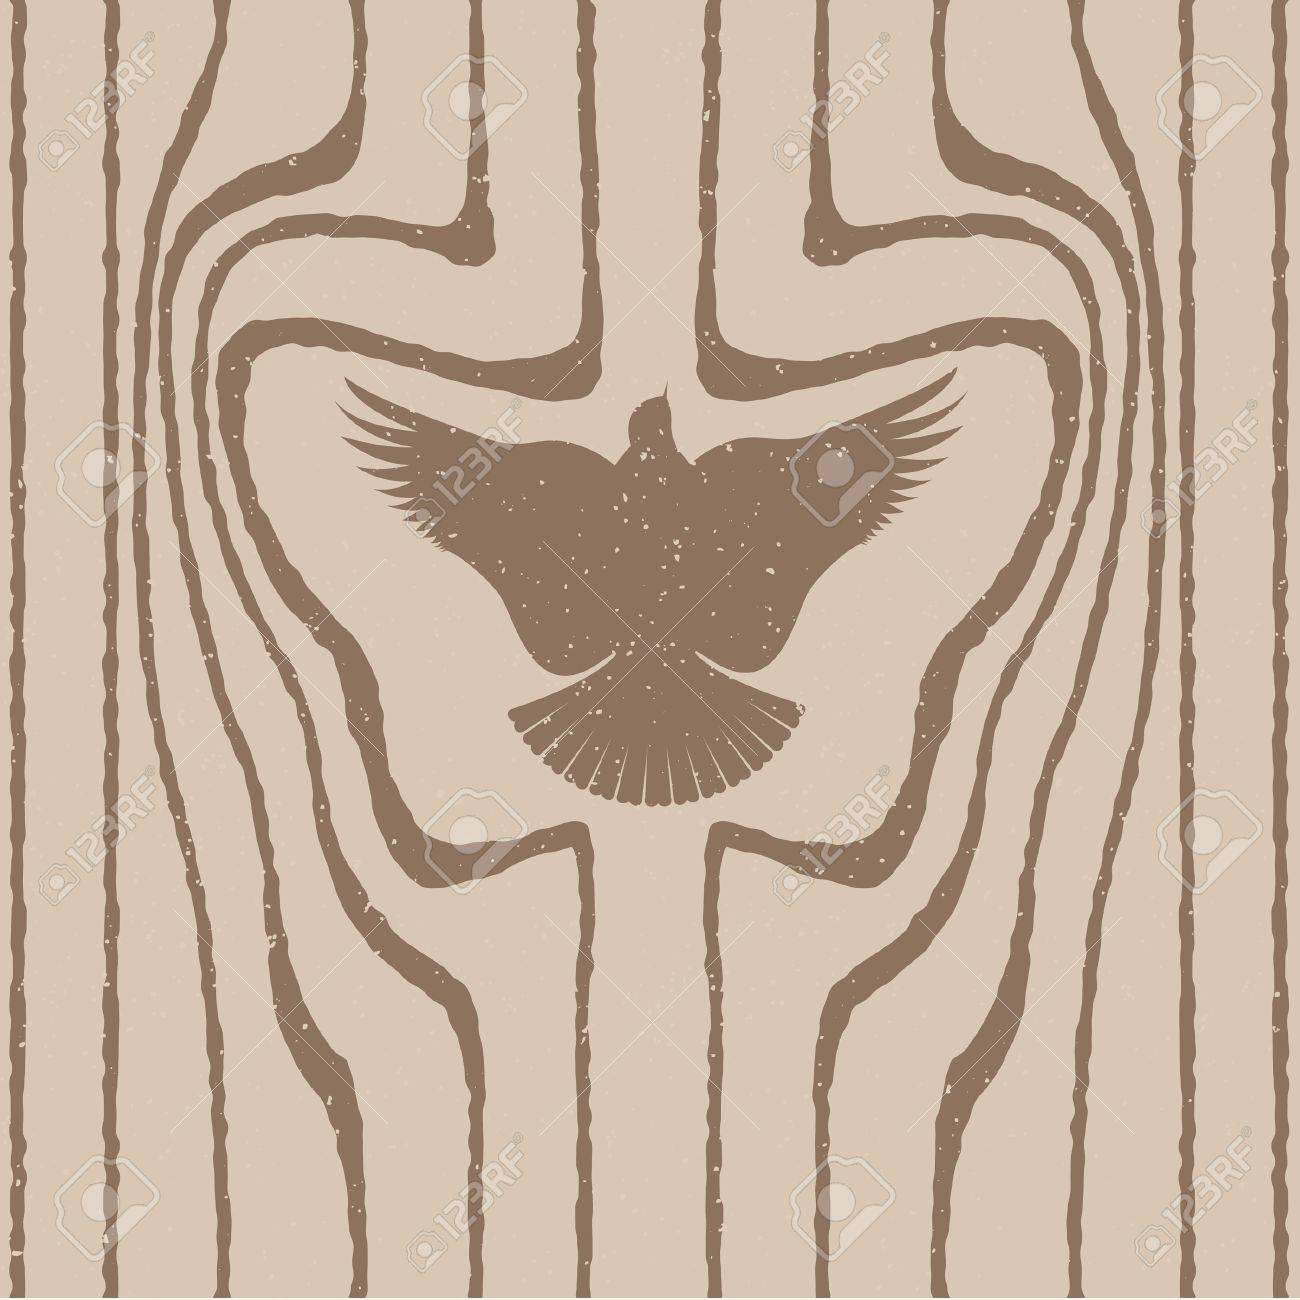 Wood grain stylized as a bird. Vector seamless background. Stock Vector - 16219330